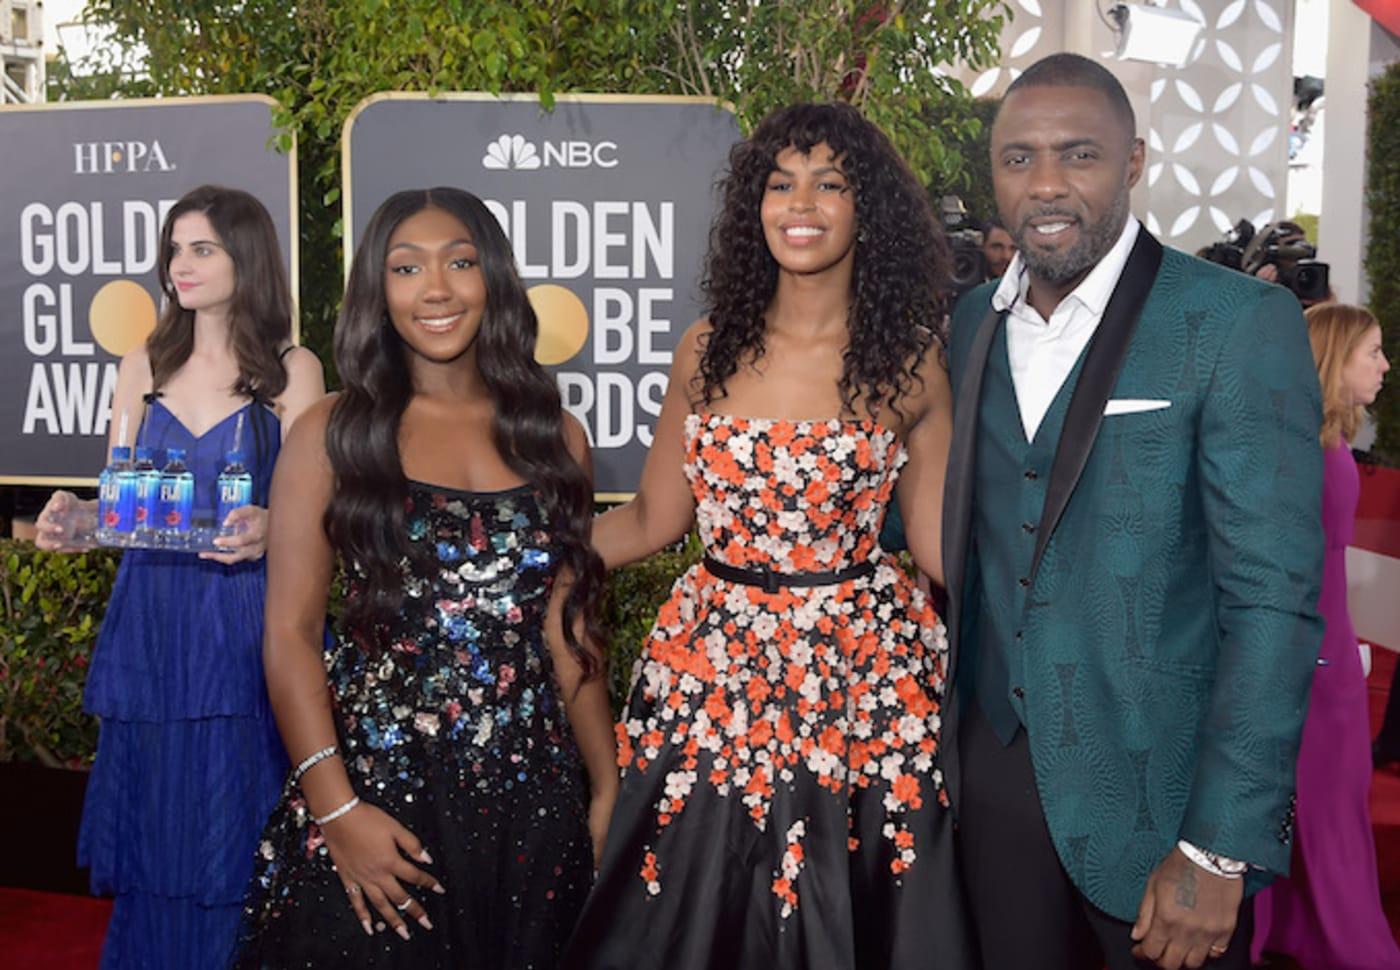 Idris Elba and family at Golden Globes